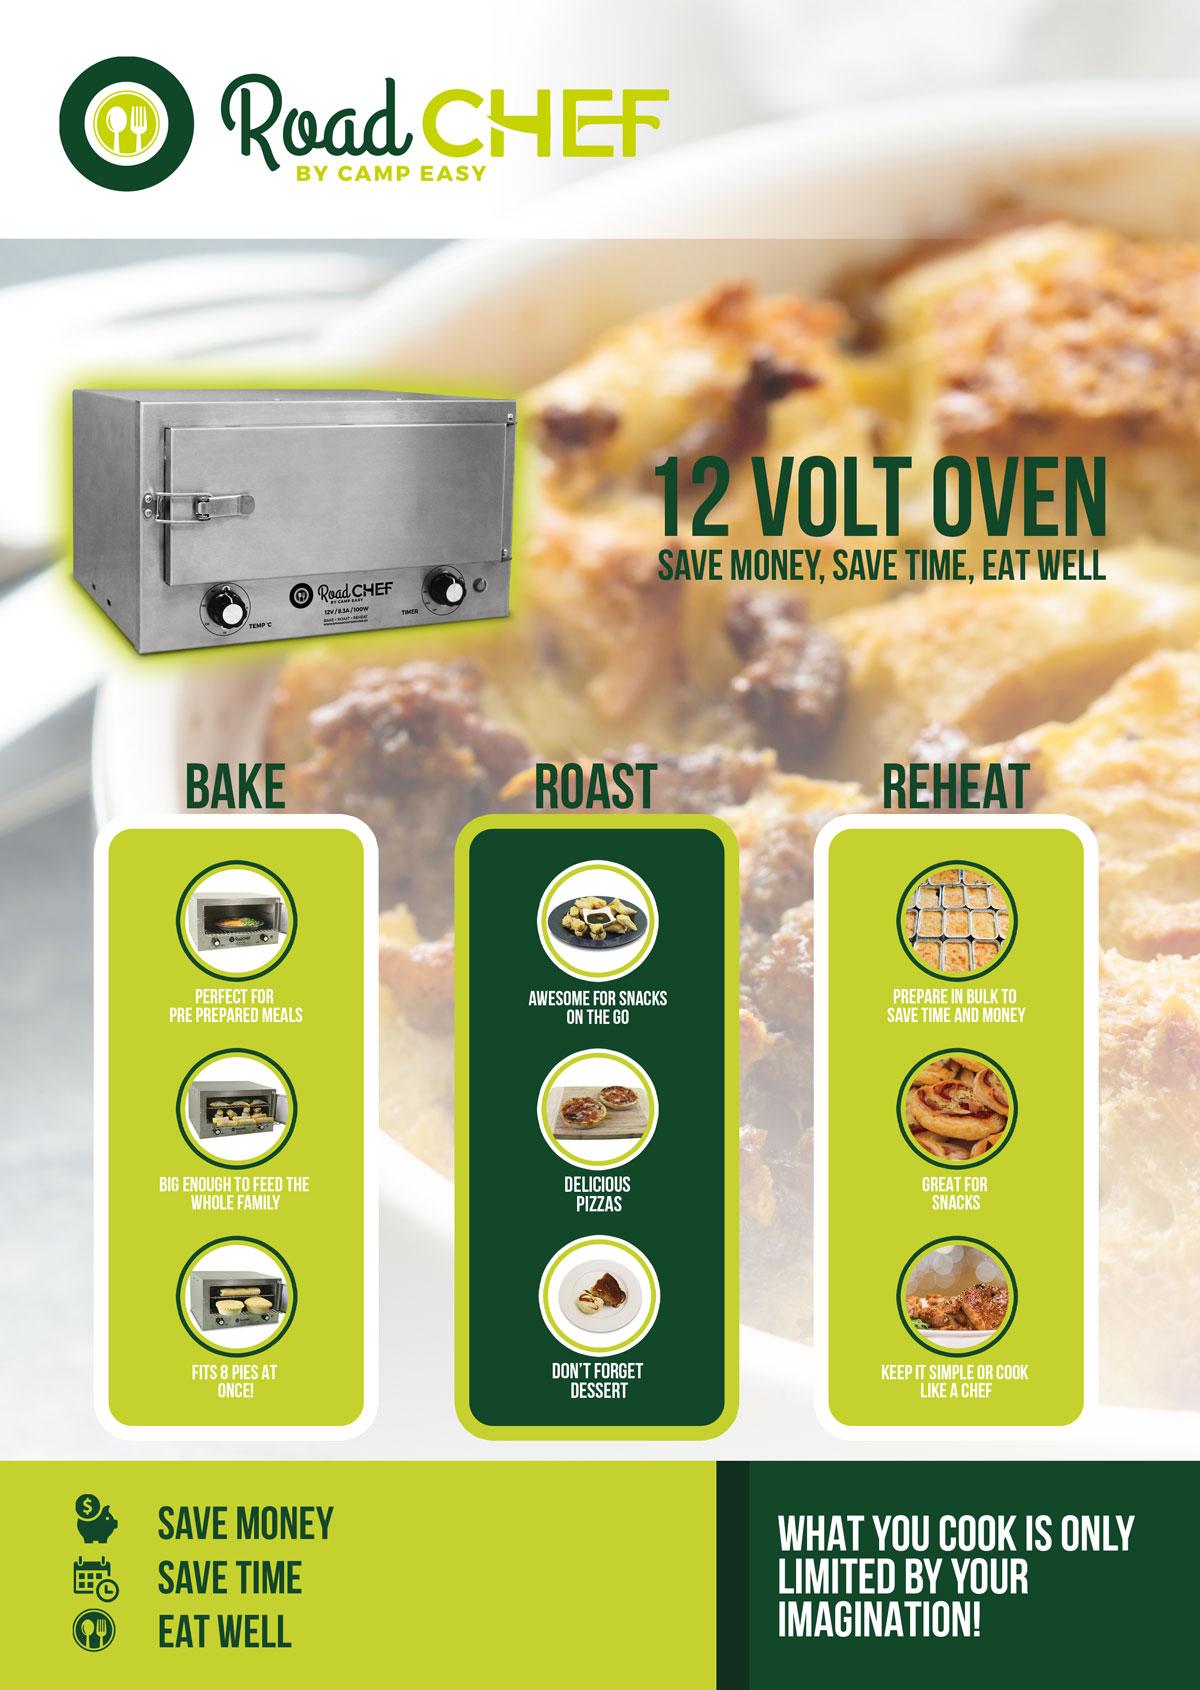 road-chef-oven-info.jpg